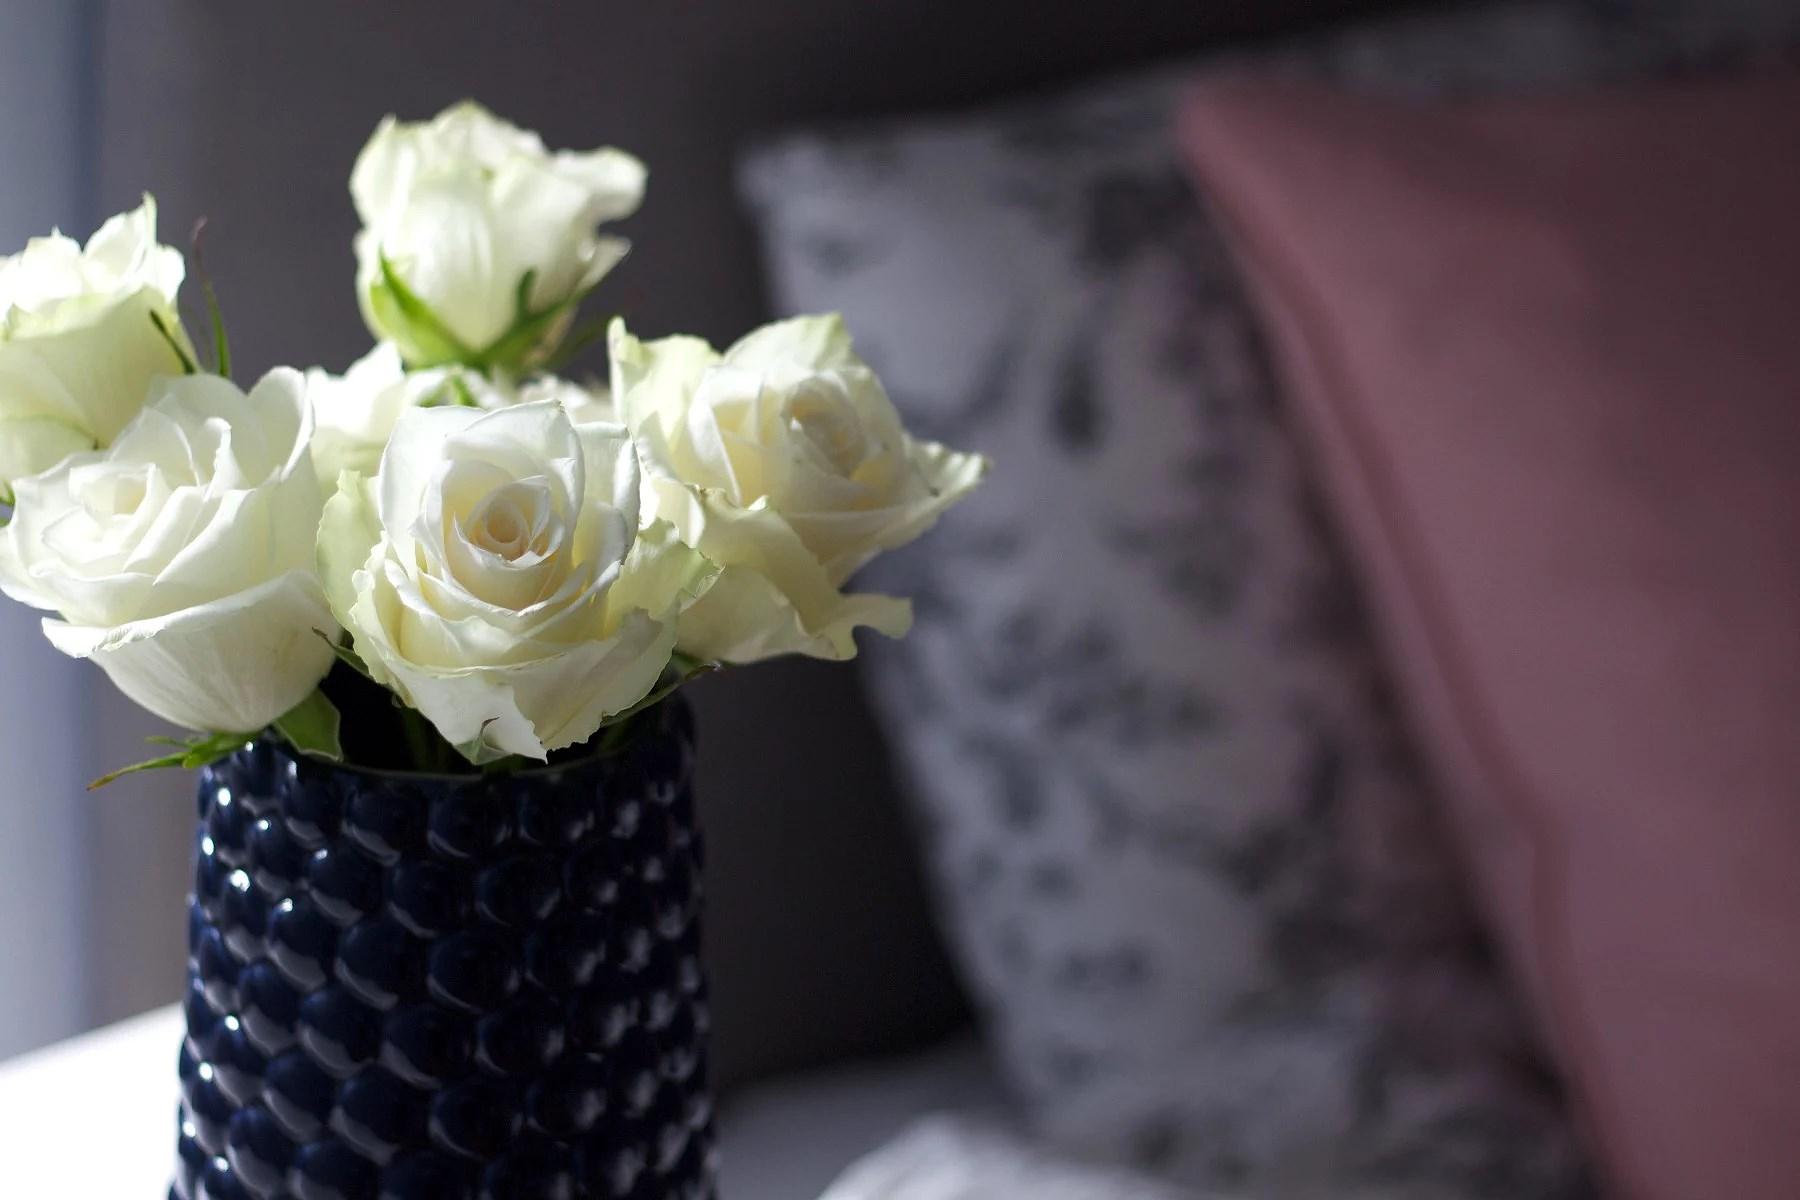 Having fresh flowers at home.